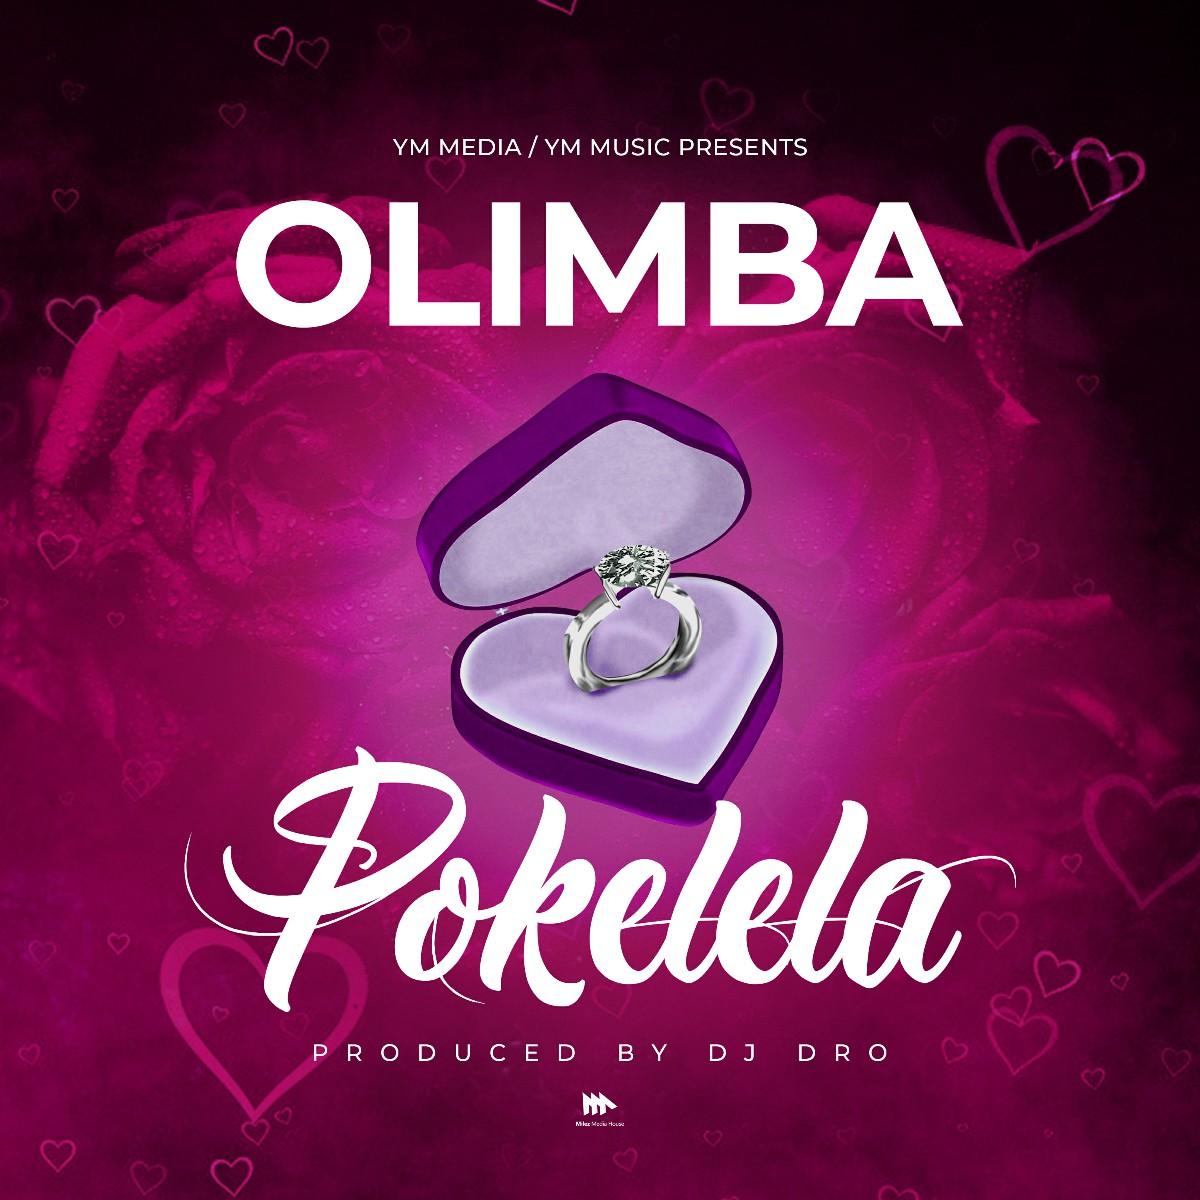 Olimba - Pokelela (Prod. DJ Dro)